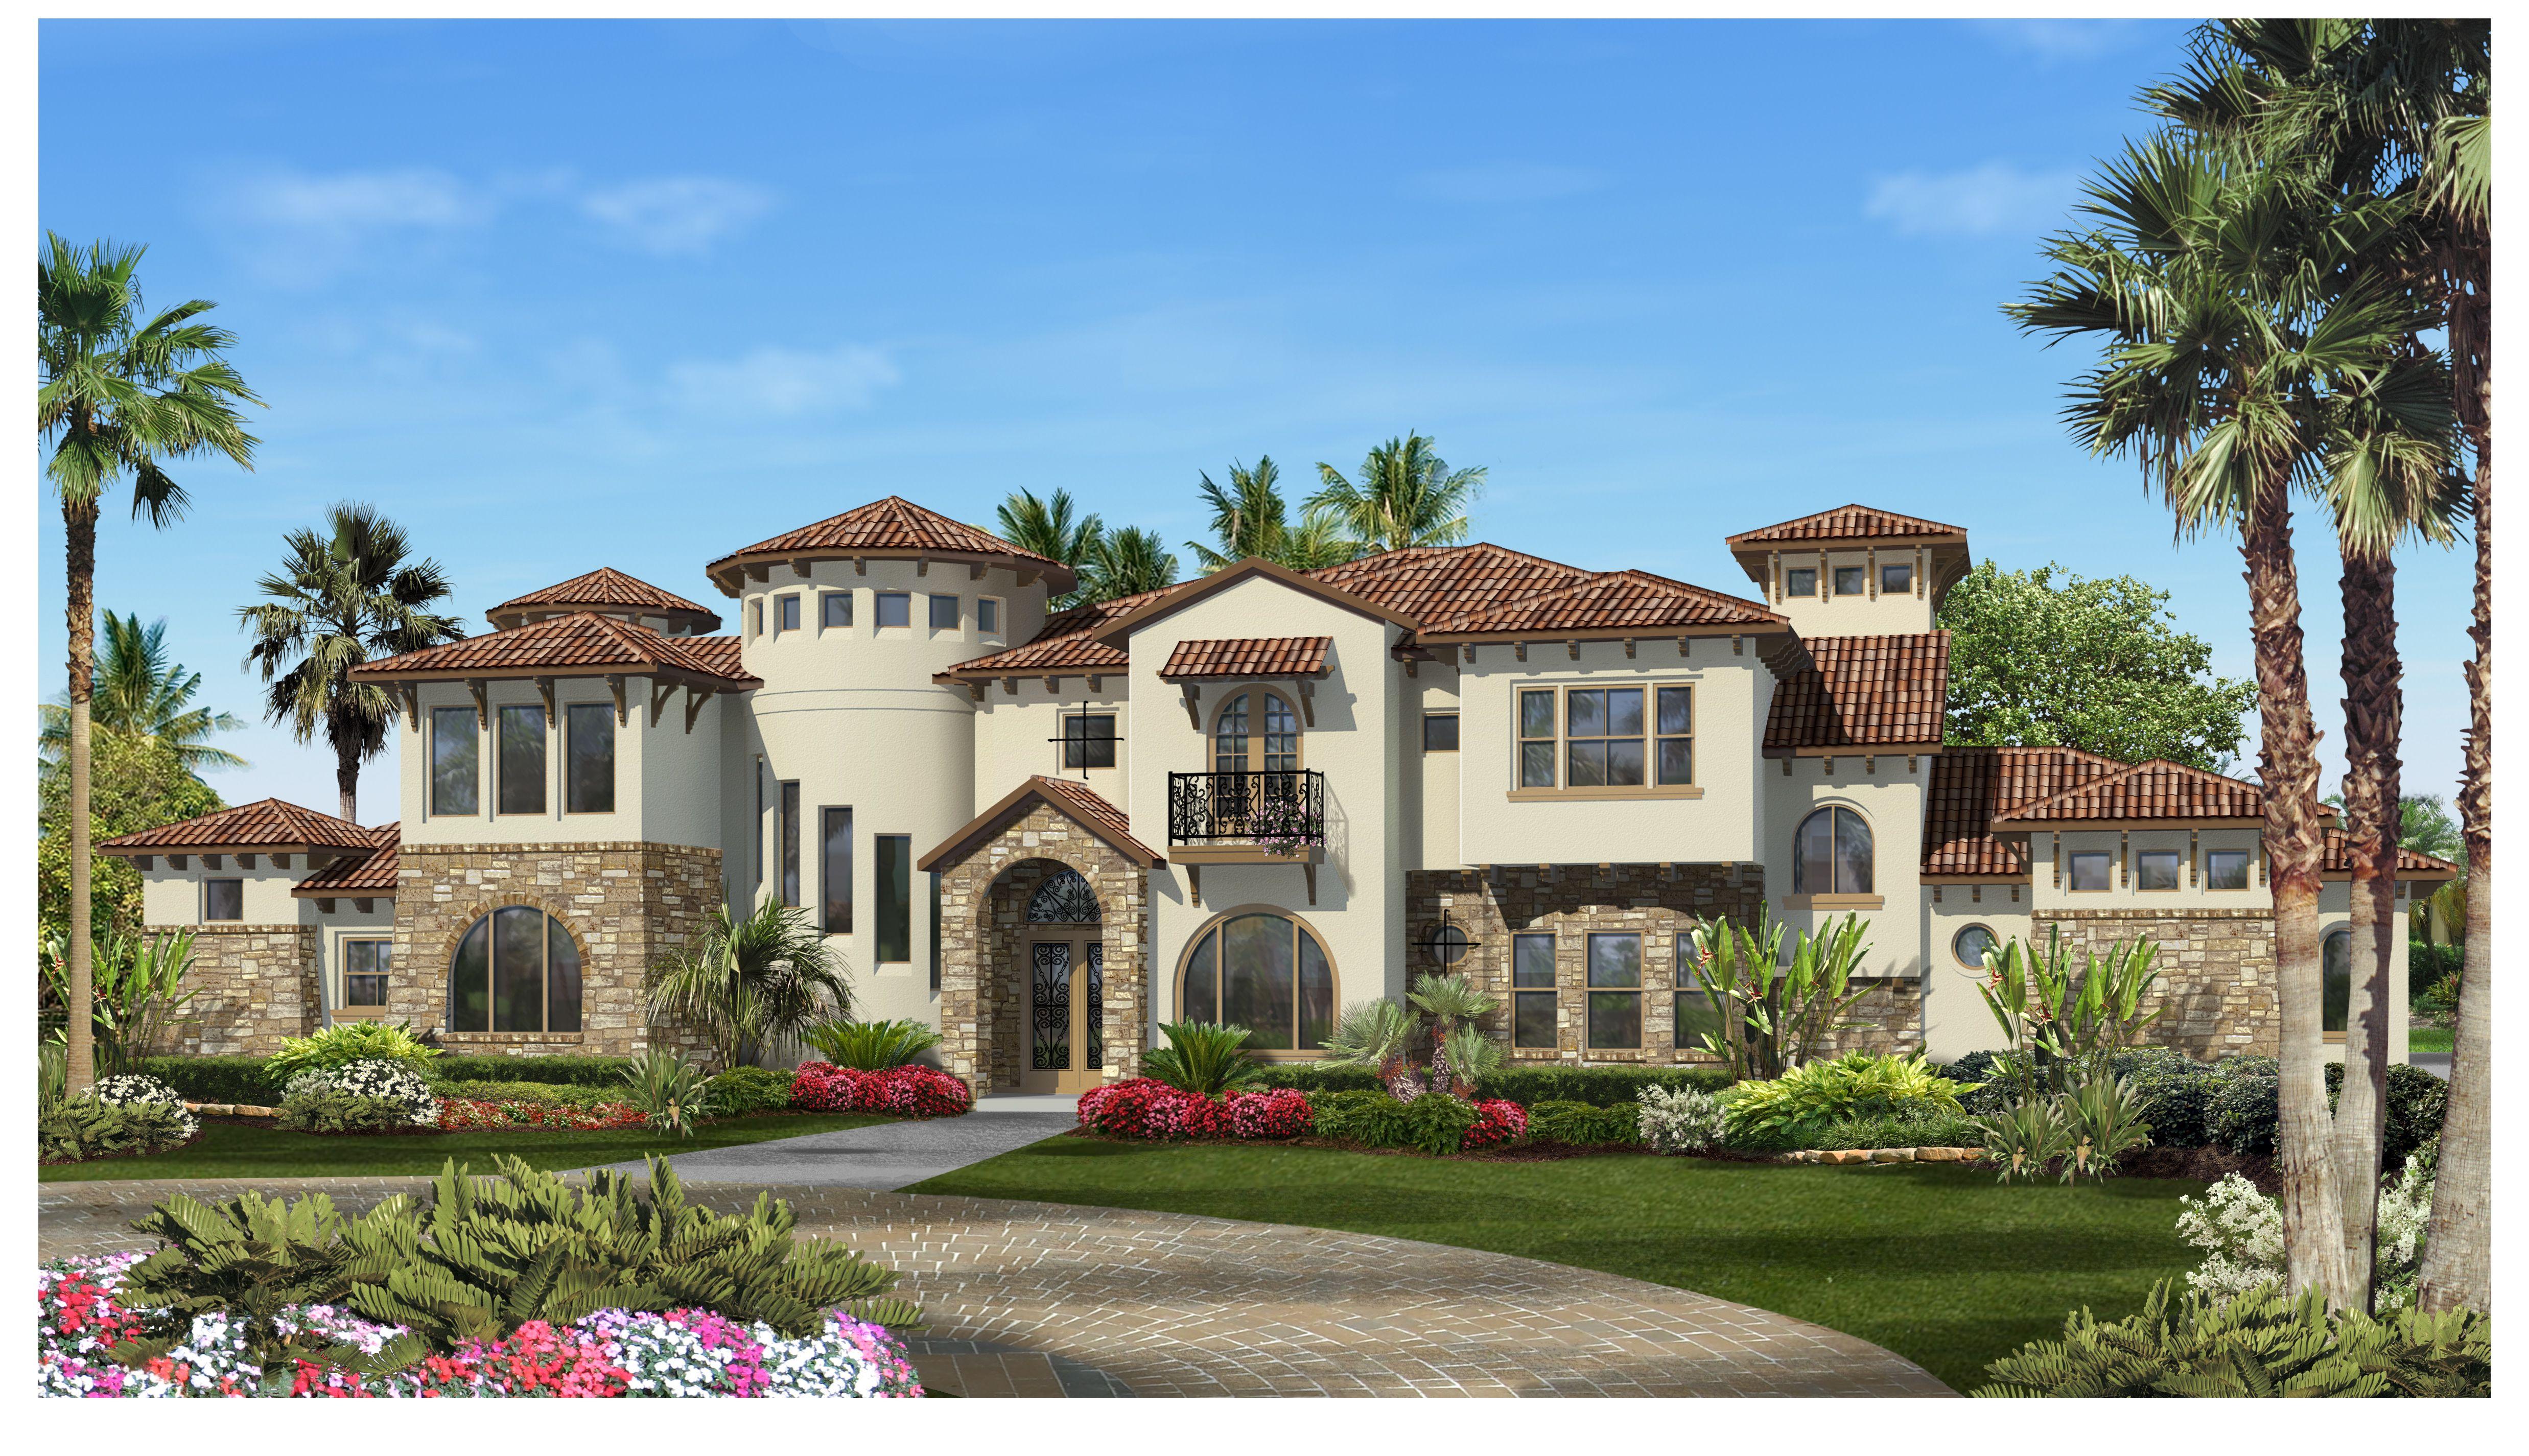 The Villa Lago – Luxury Home Floor Plans | Design Tech Homes | Texas ...